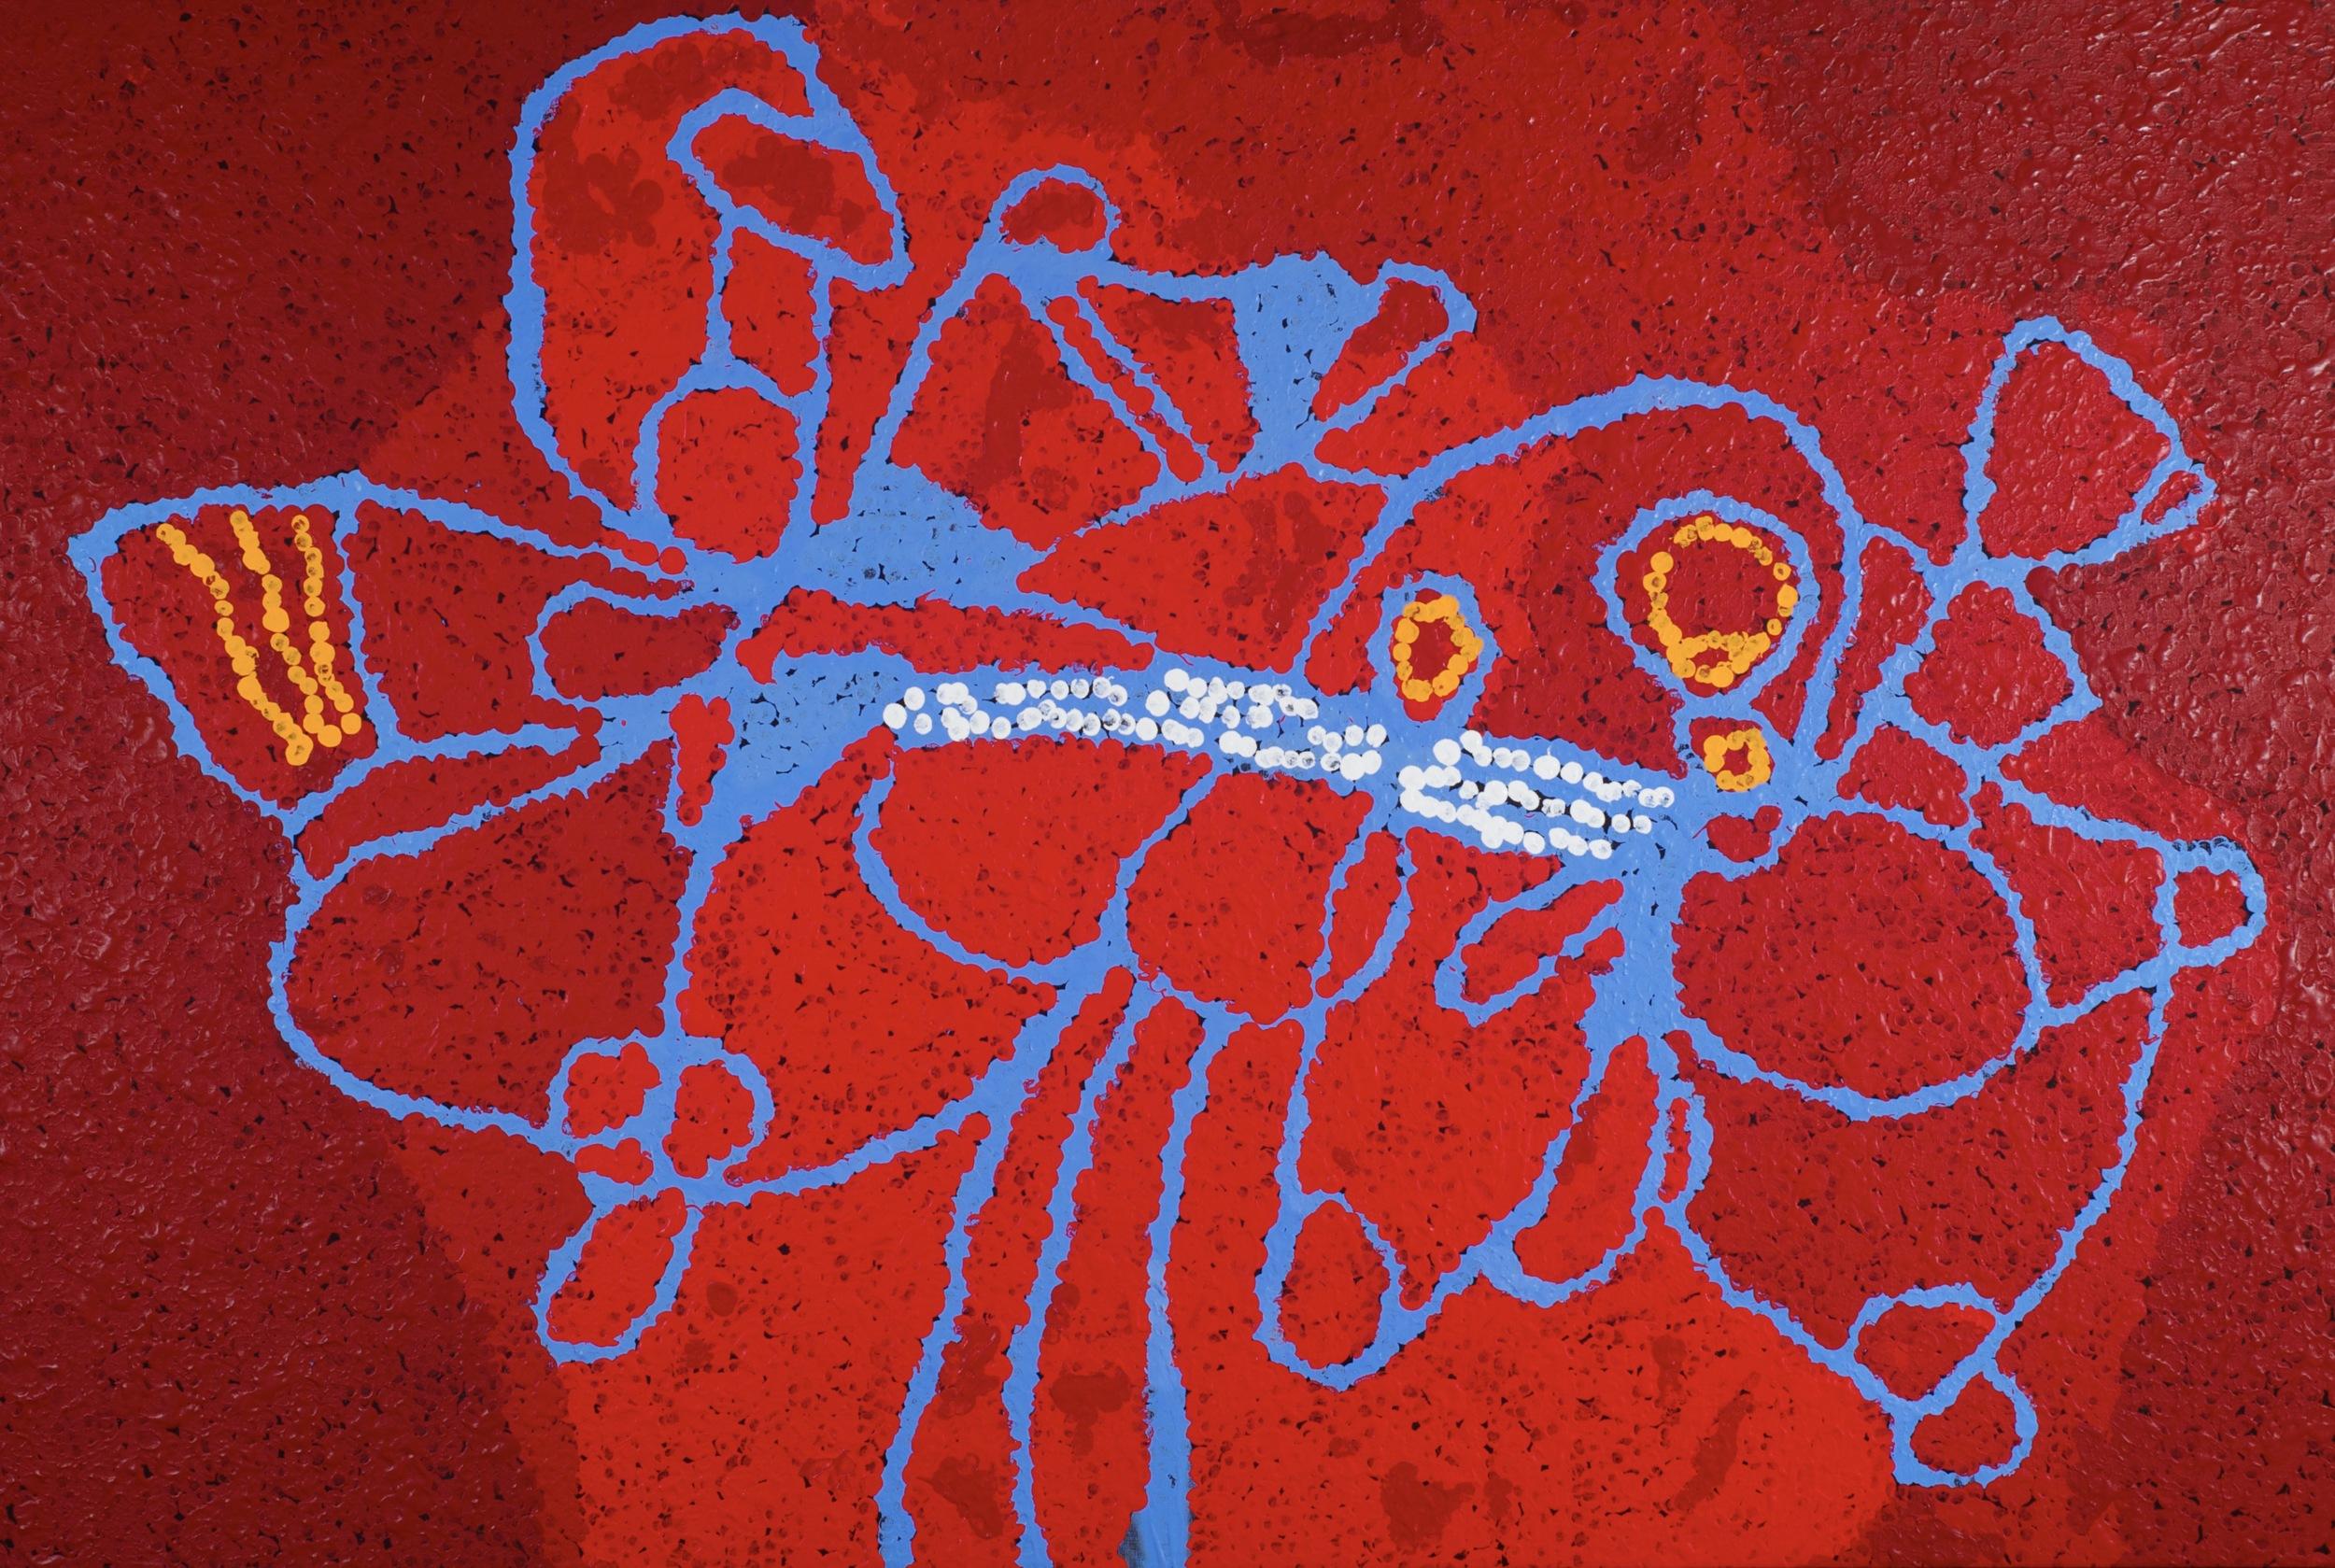 Tommy Watson 'Untitled' 146cm x 100cm